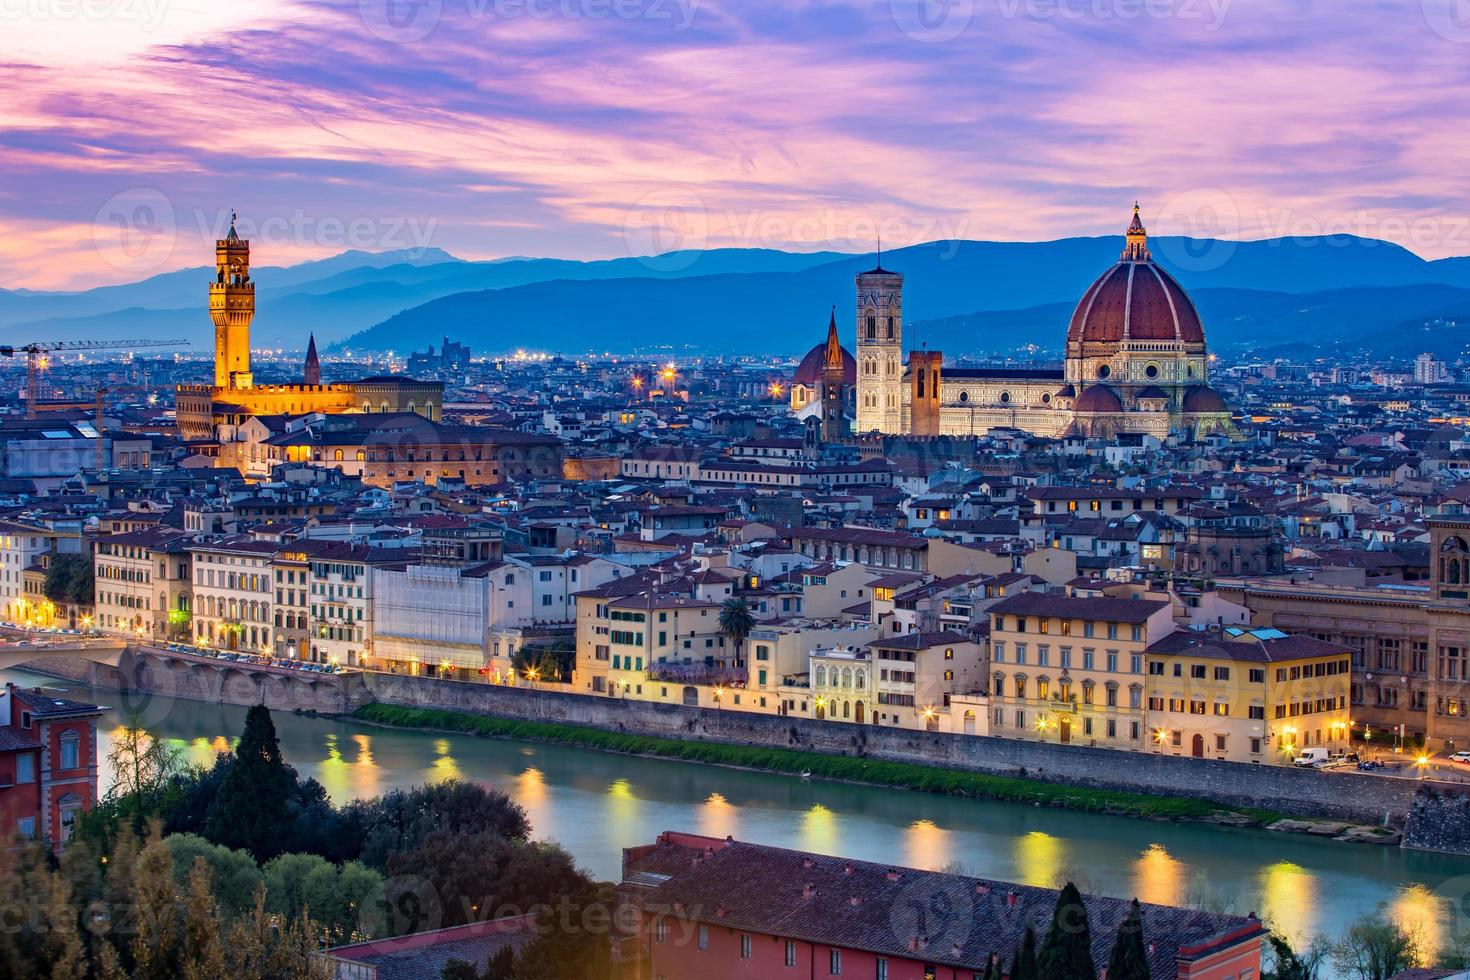 Paisaje urbano de Florencia en Toscana, Italia foto